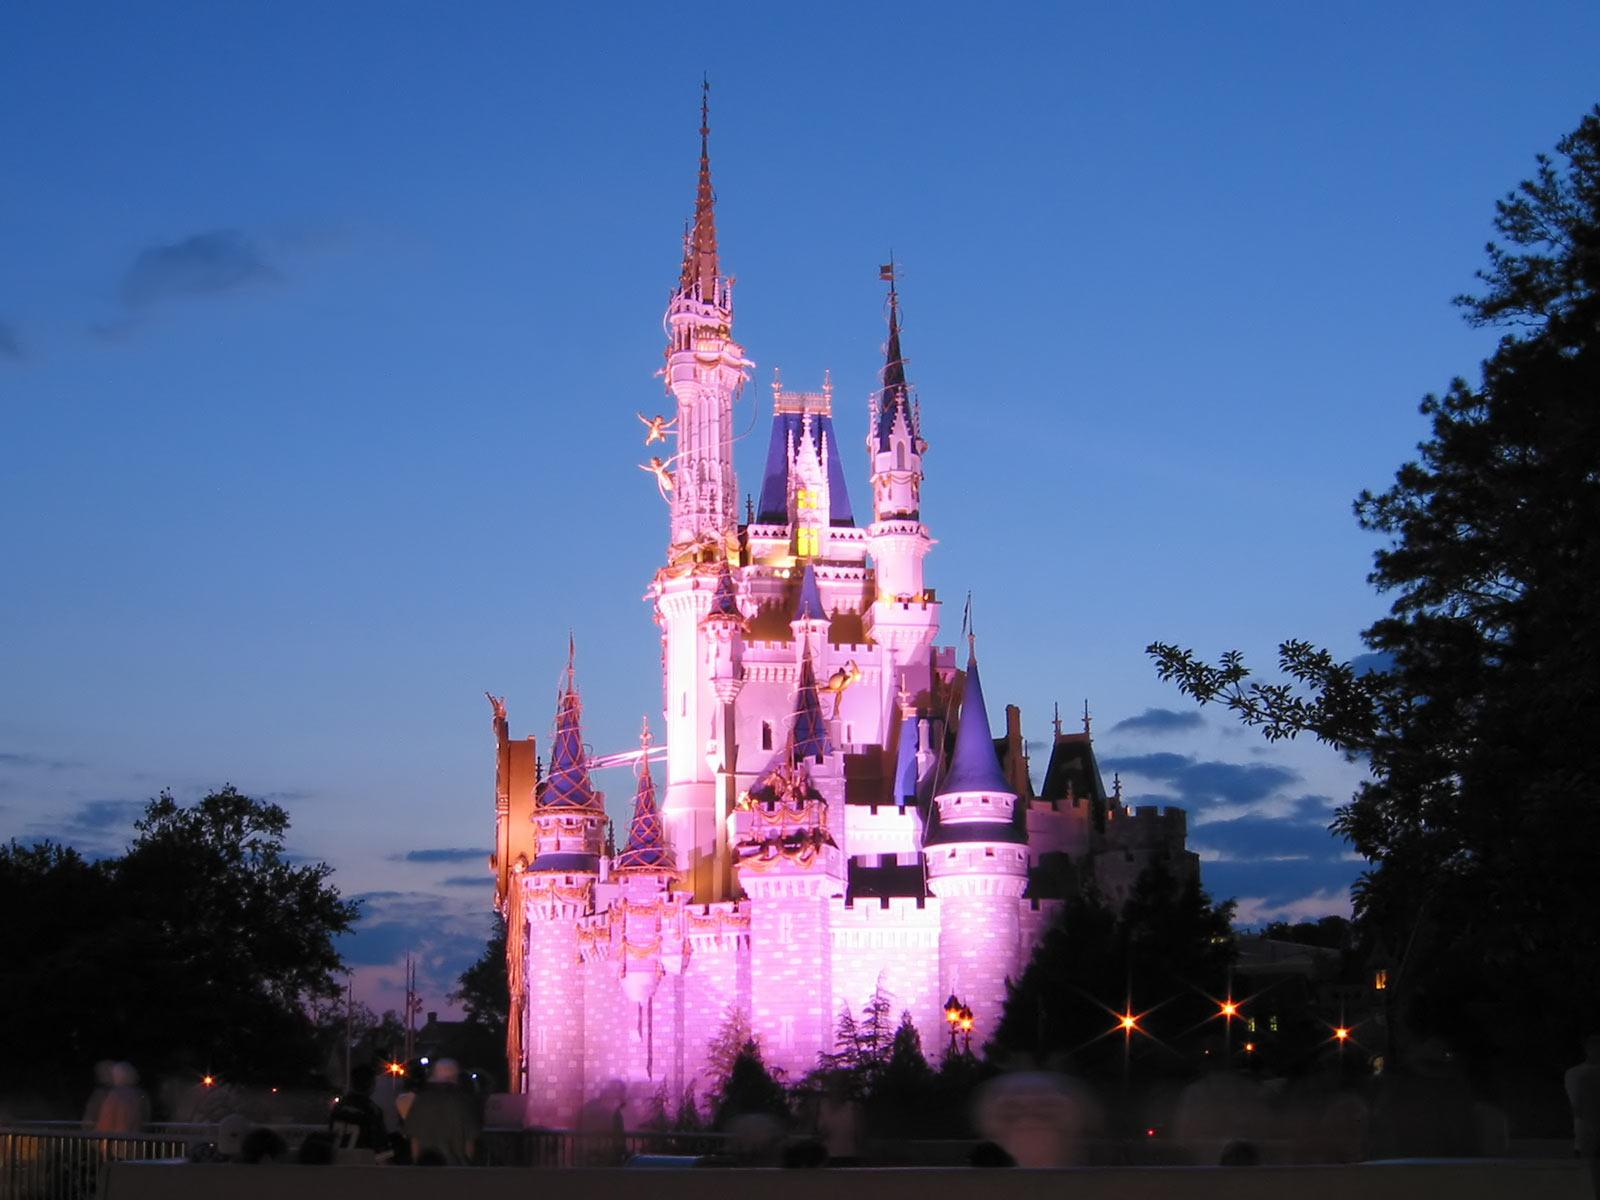 Disney Castle Wallpaper 902 Hd Wallpapers in Cartoons   Imagescicom 1600x1200